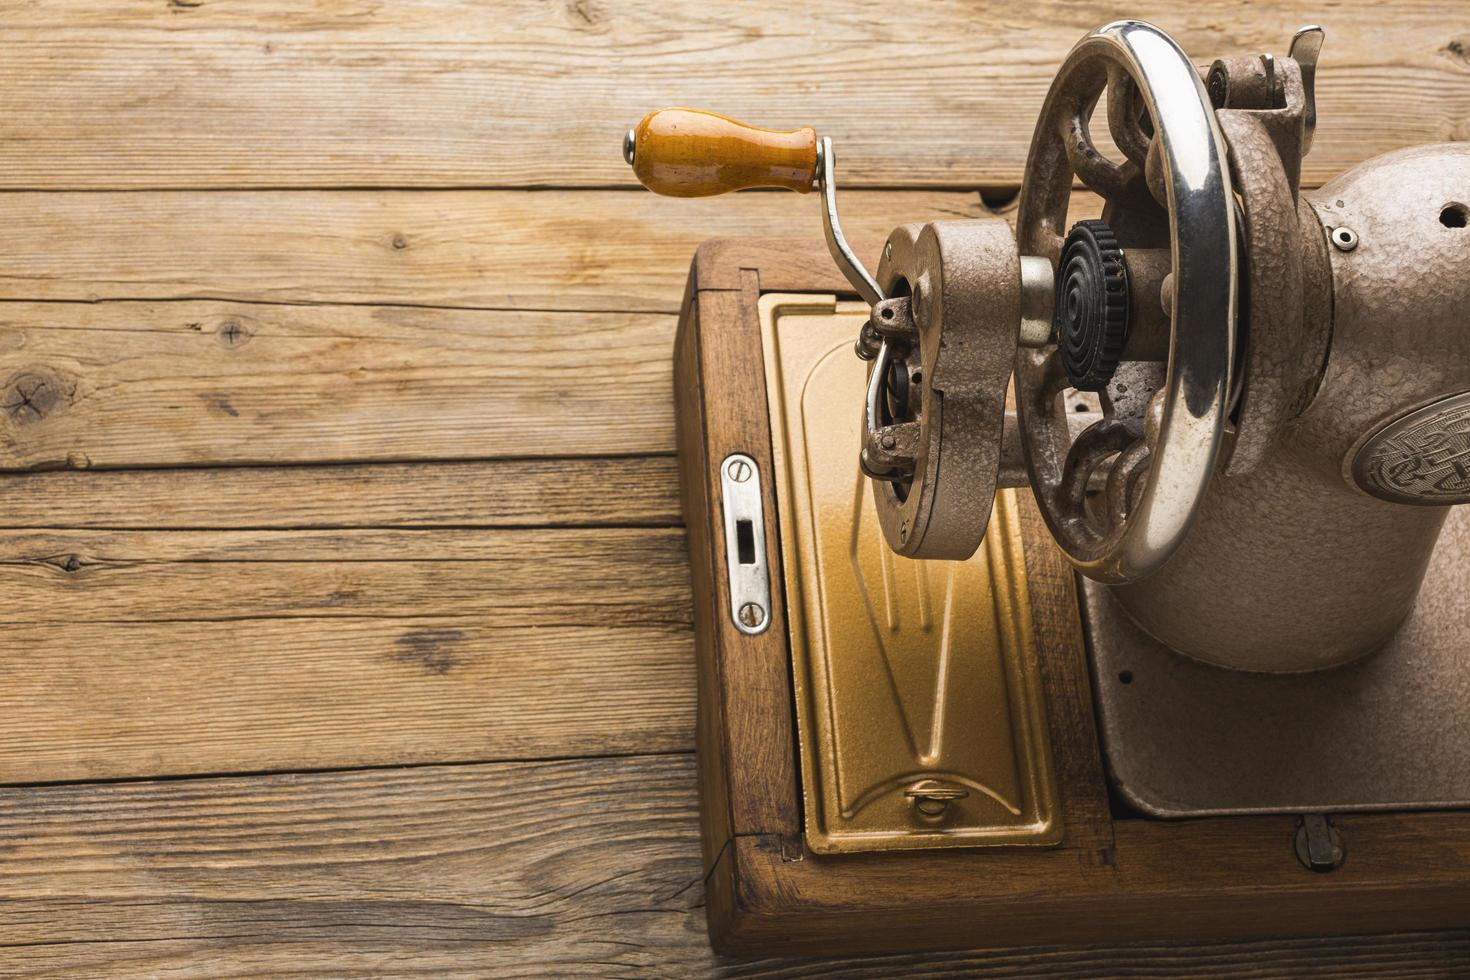 naaimachine op hout foto